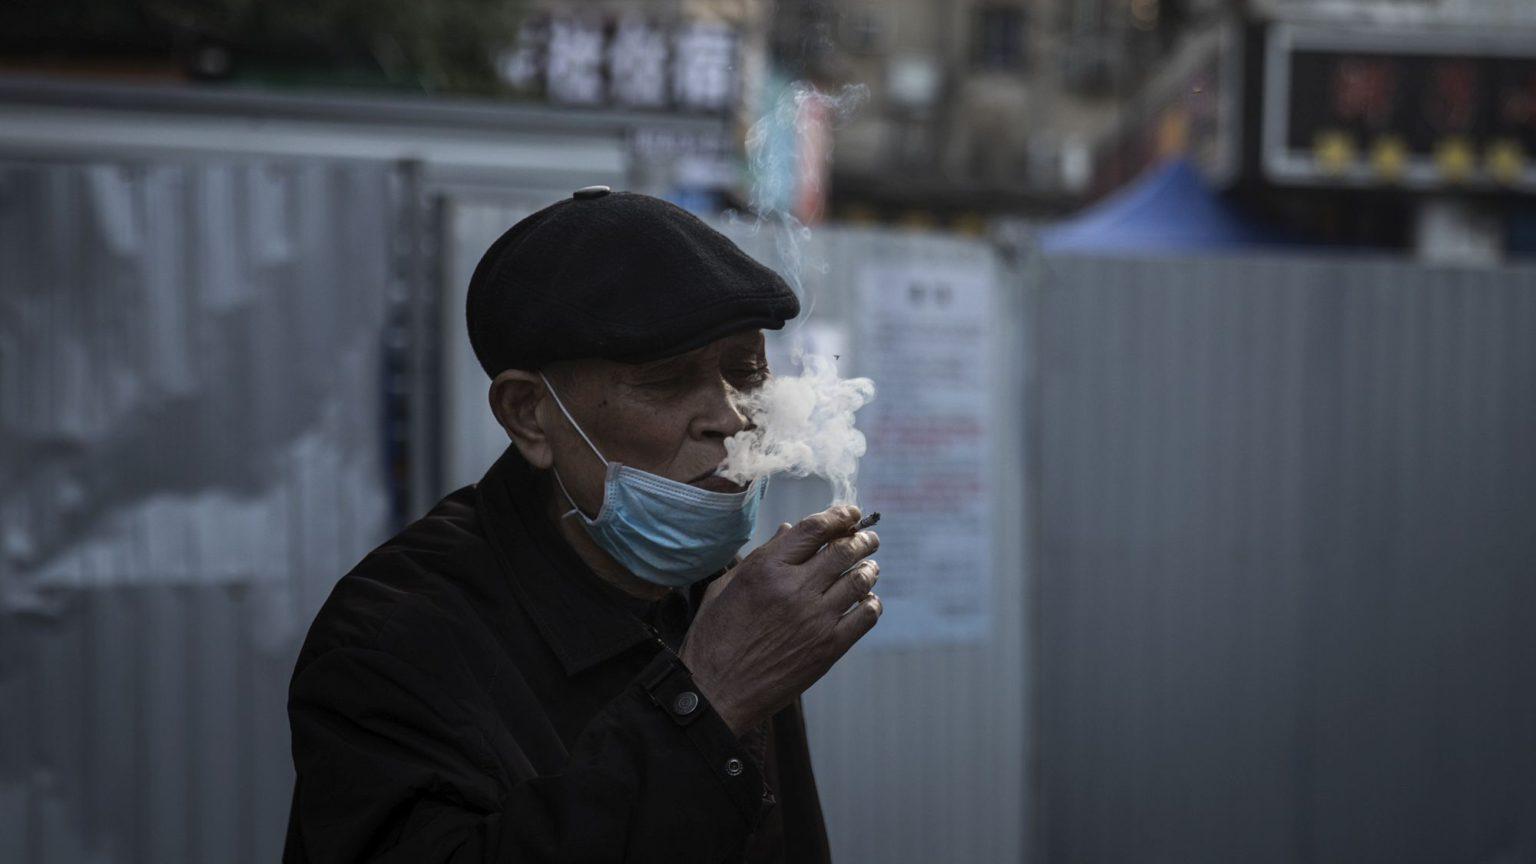 Smoke fags, save lives